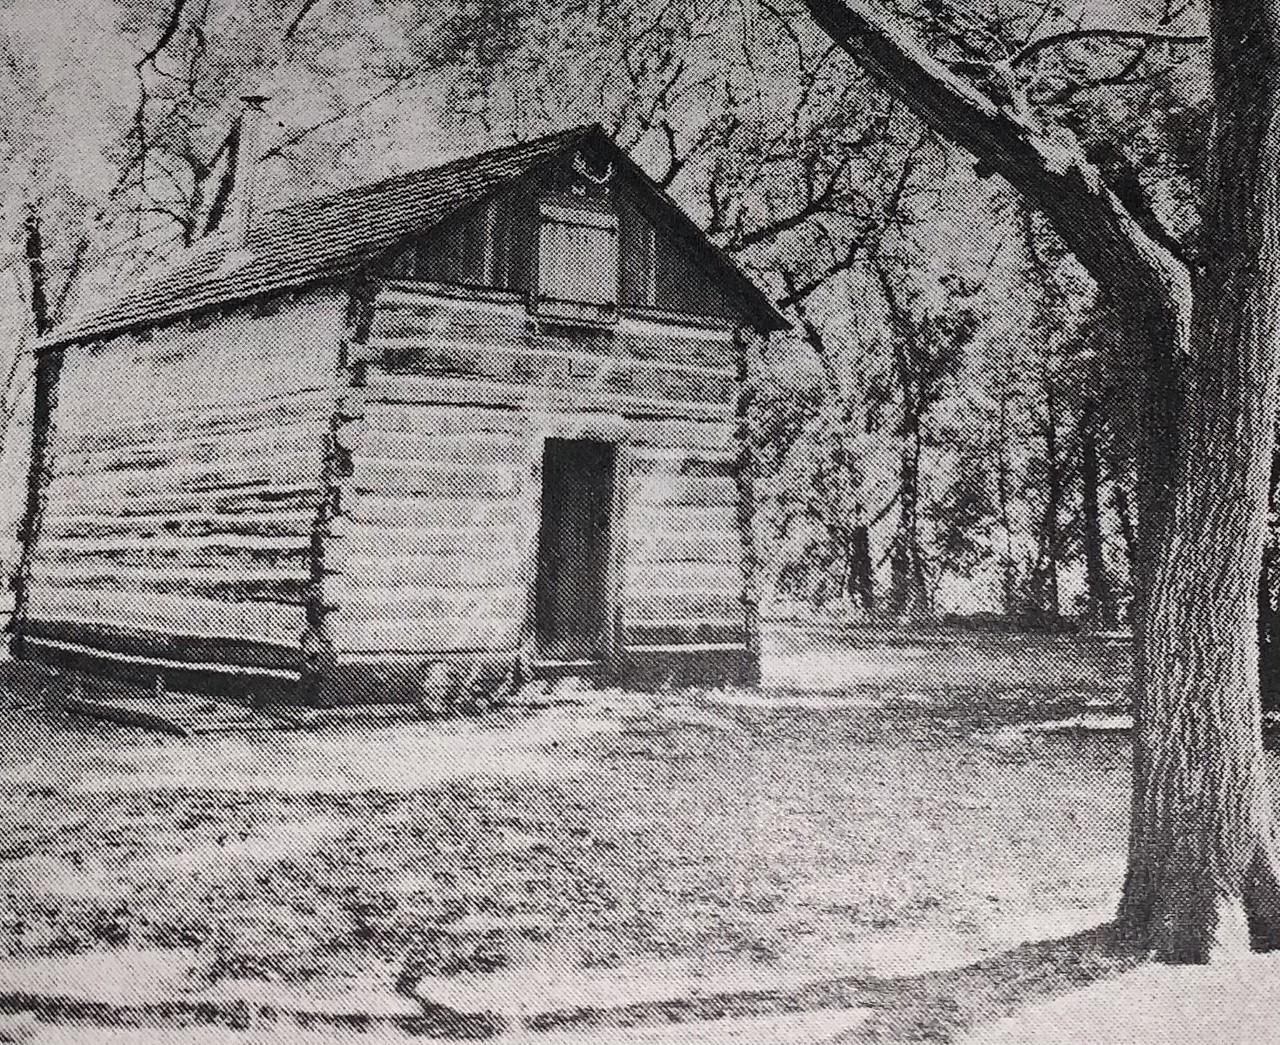 Building, Tree, Wood, House